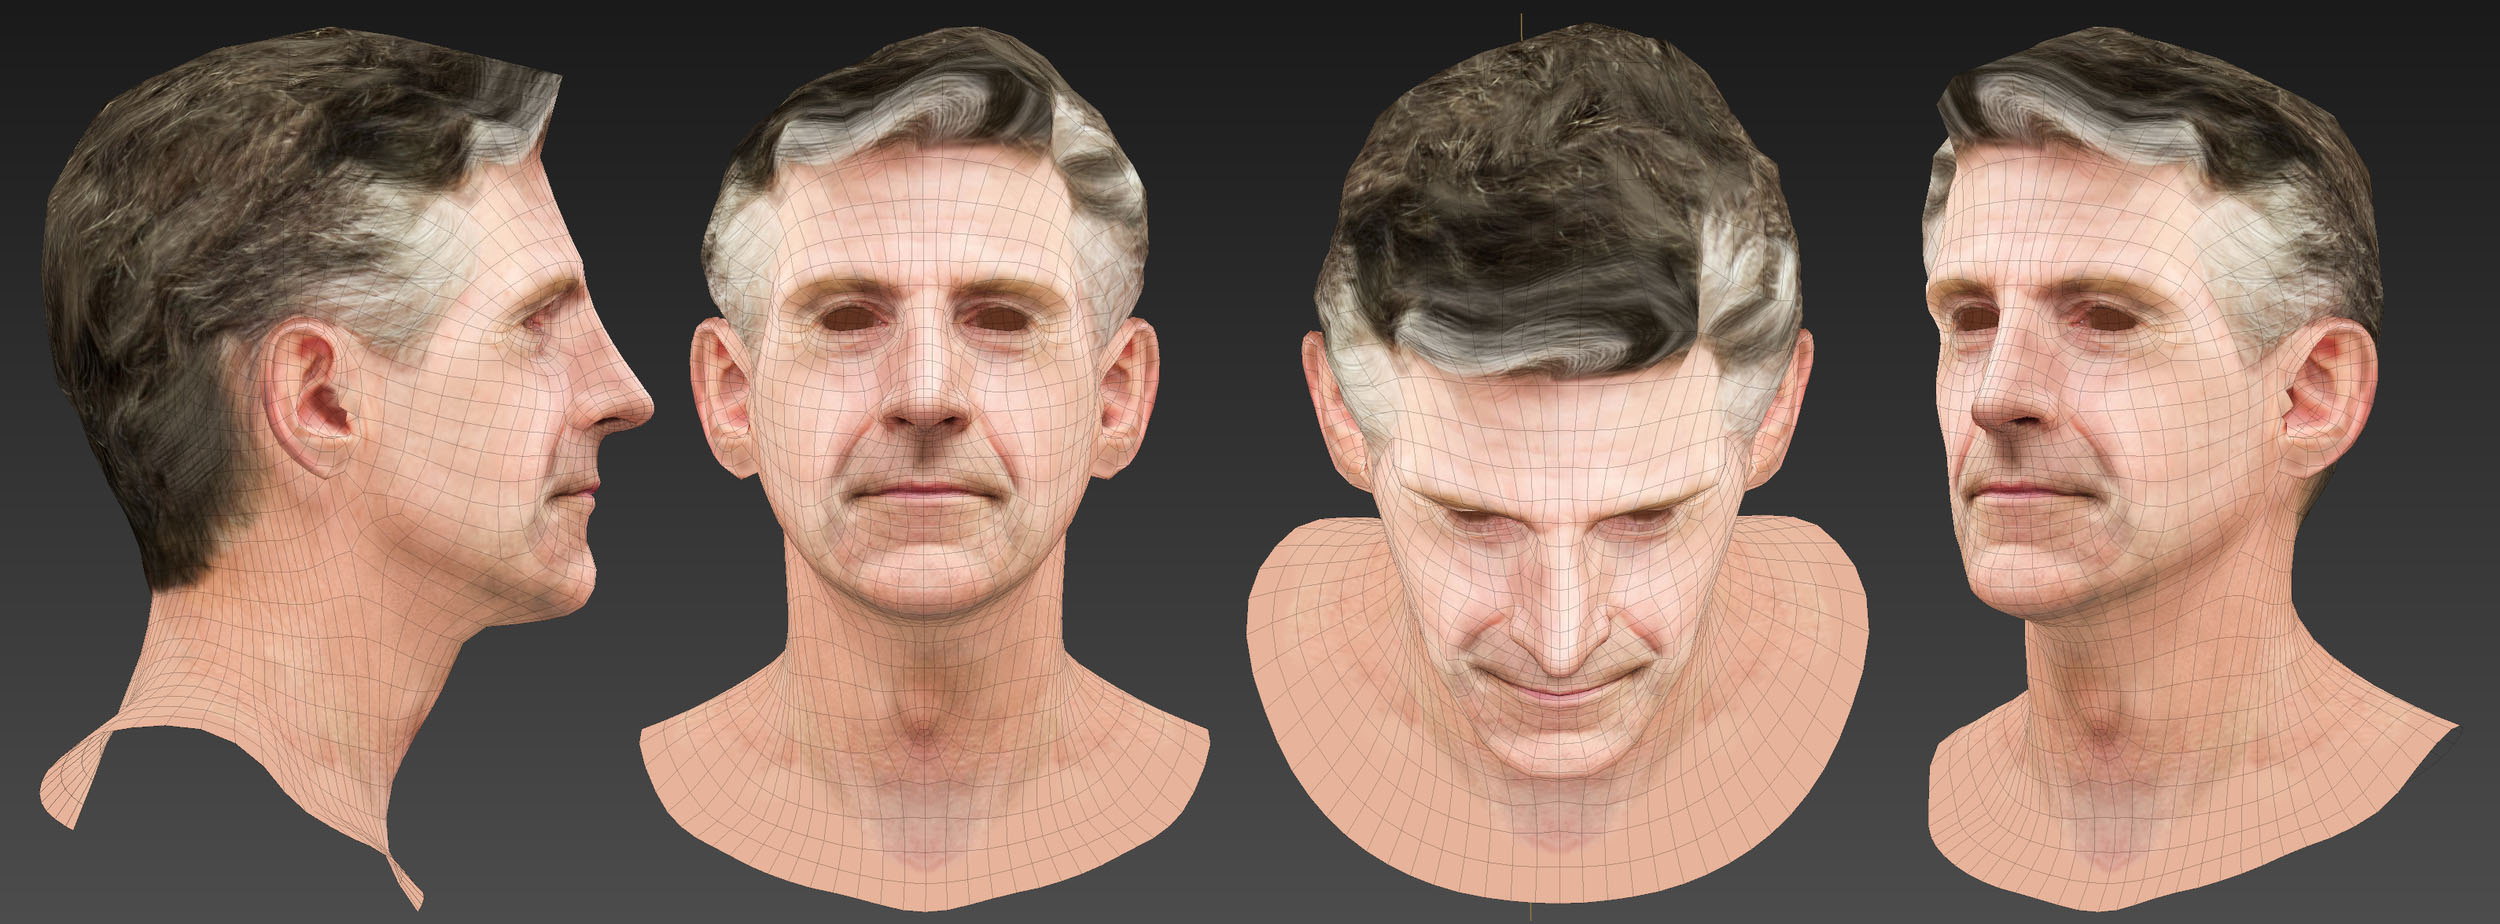 Augmented Reality - Axalta Interactive 02.jpg